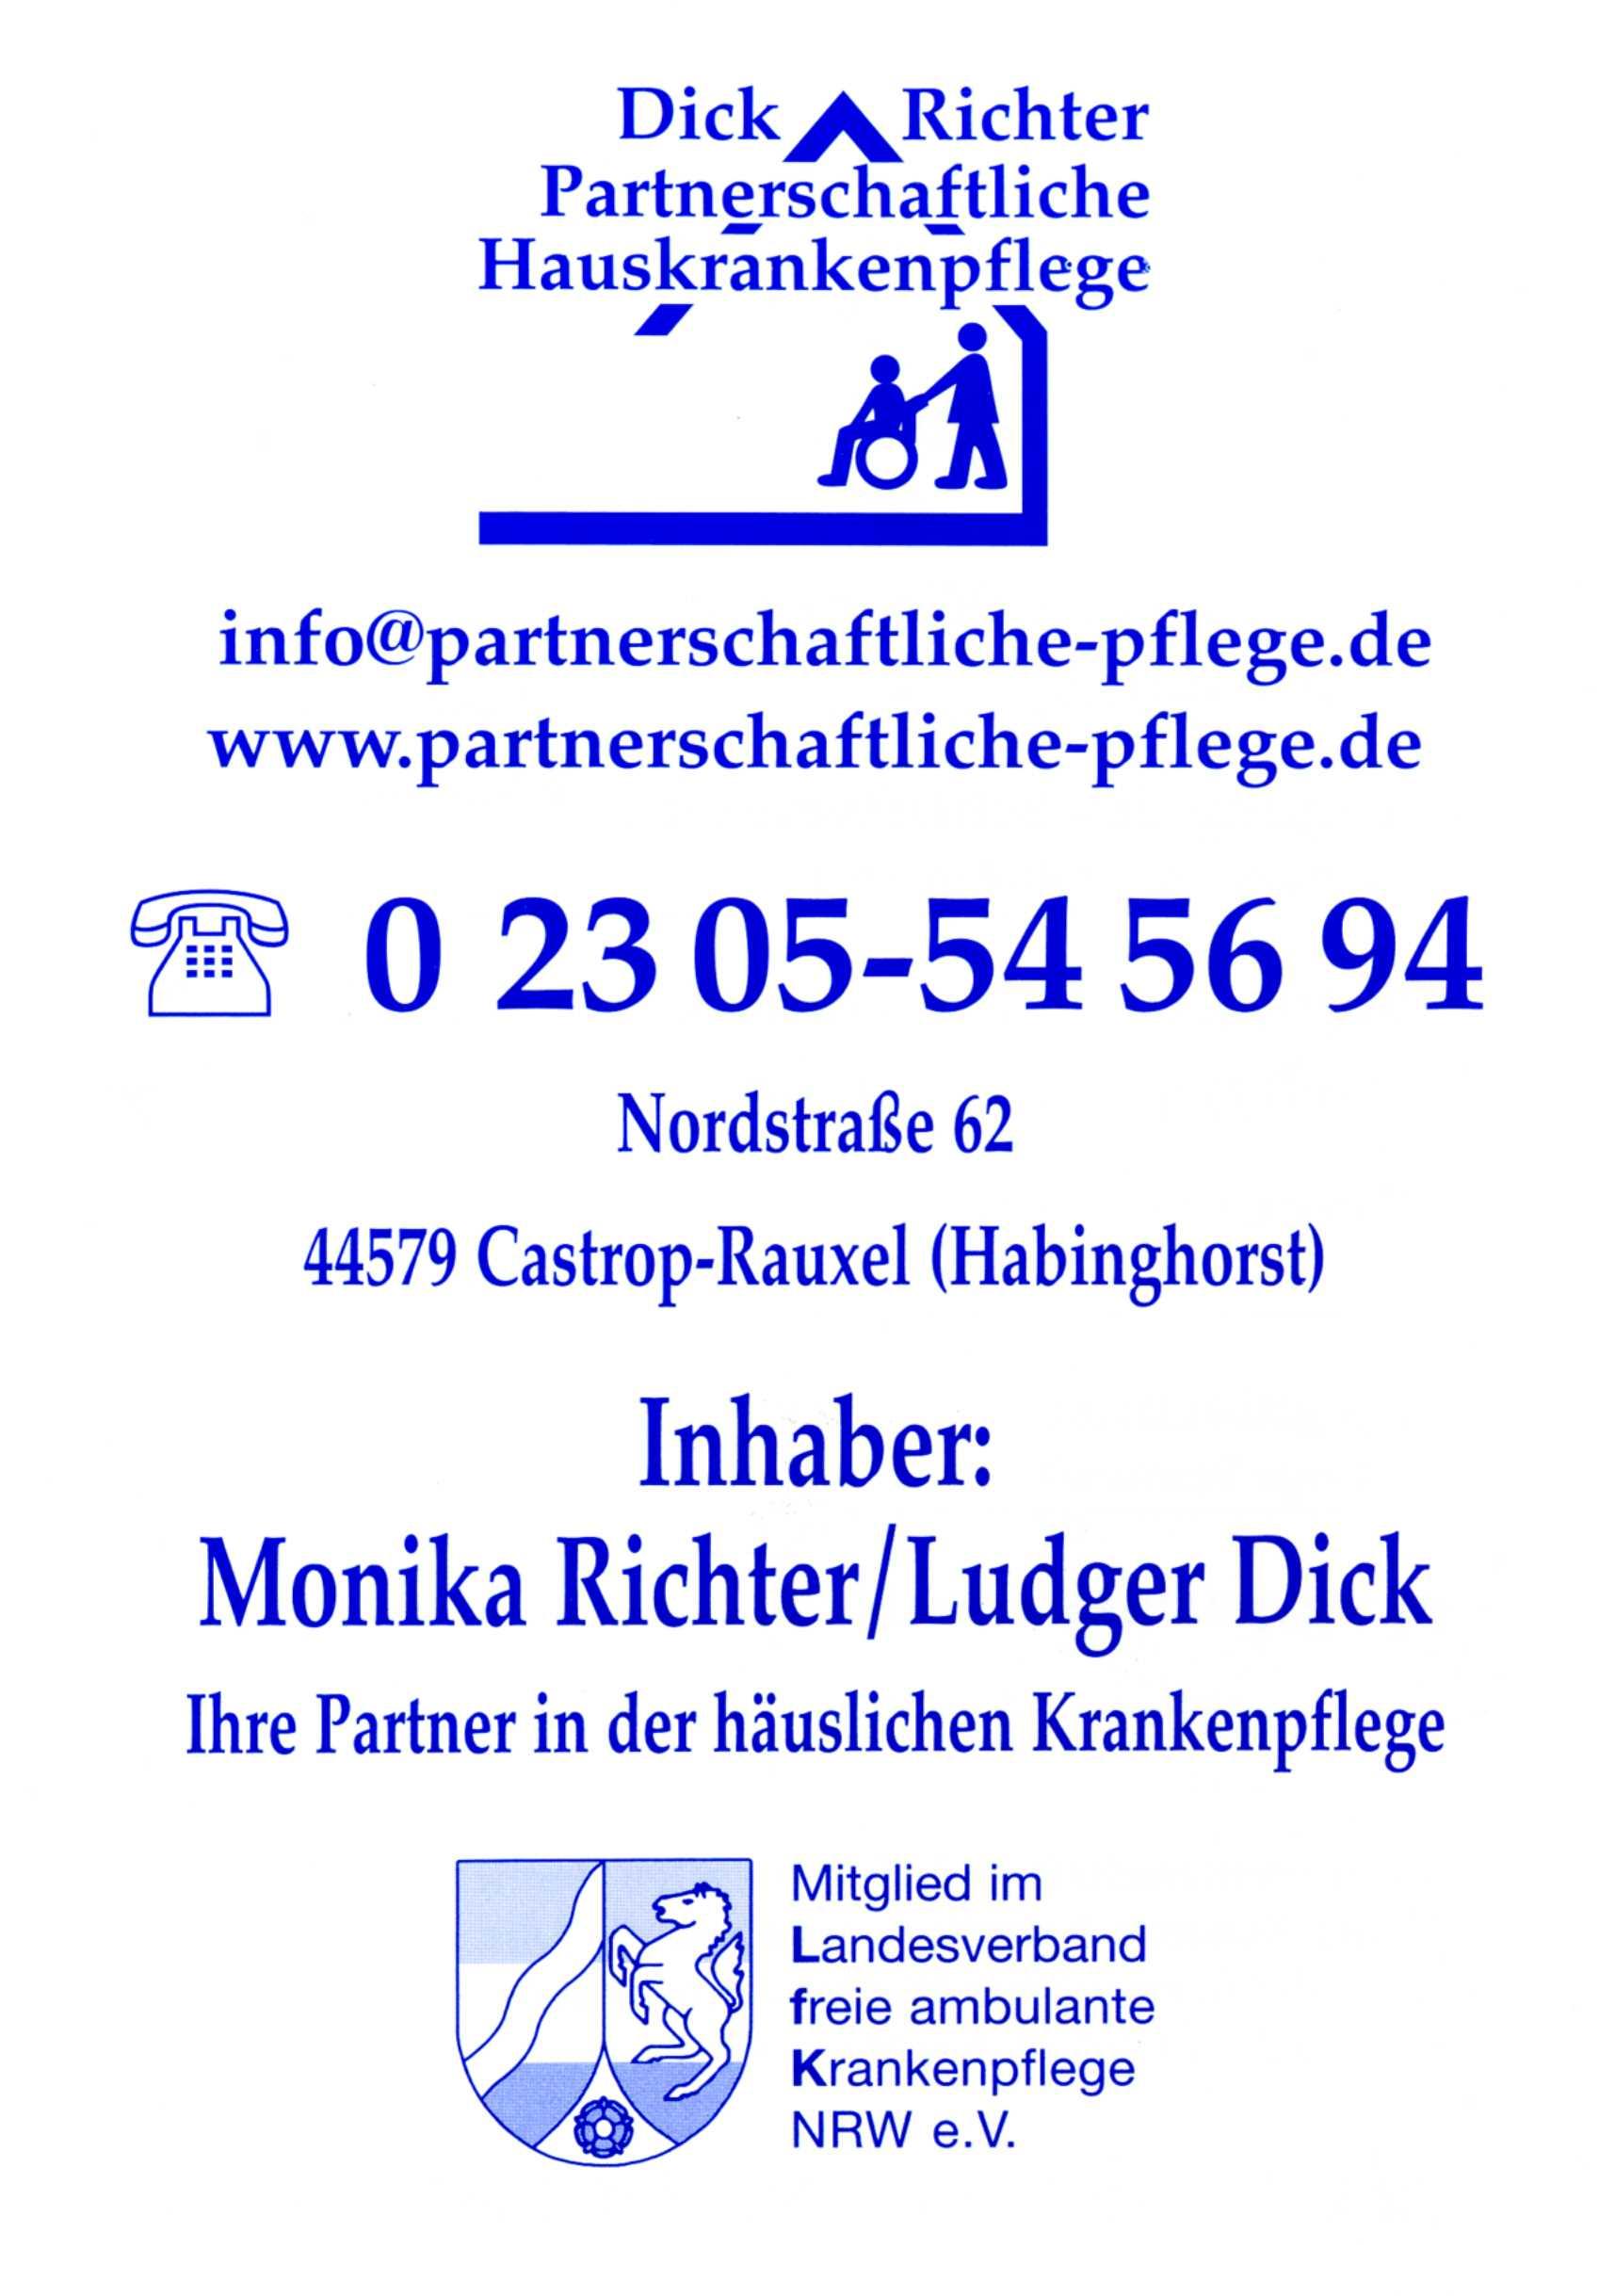 Dick Richter - Partnerliche Hauskrankenpflege